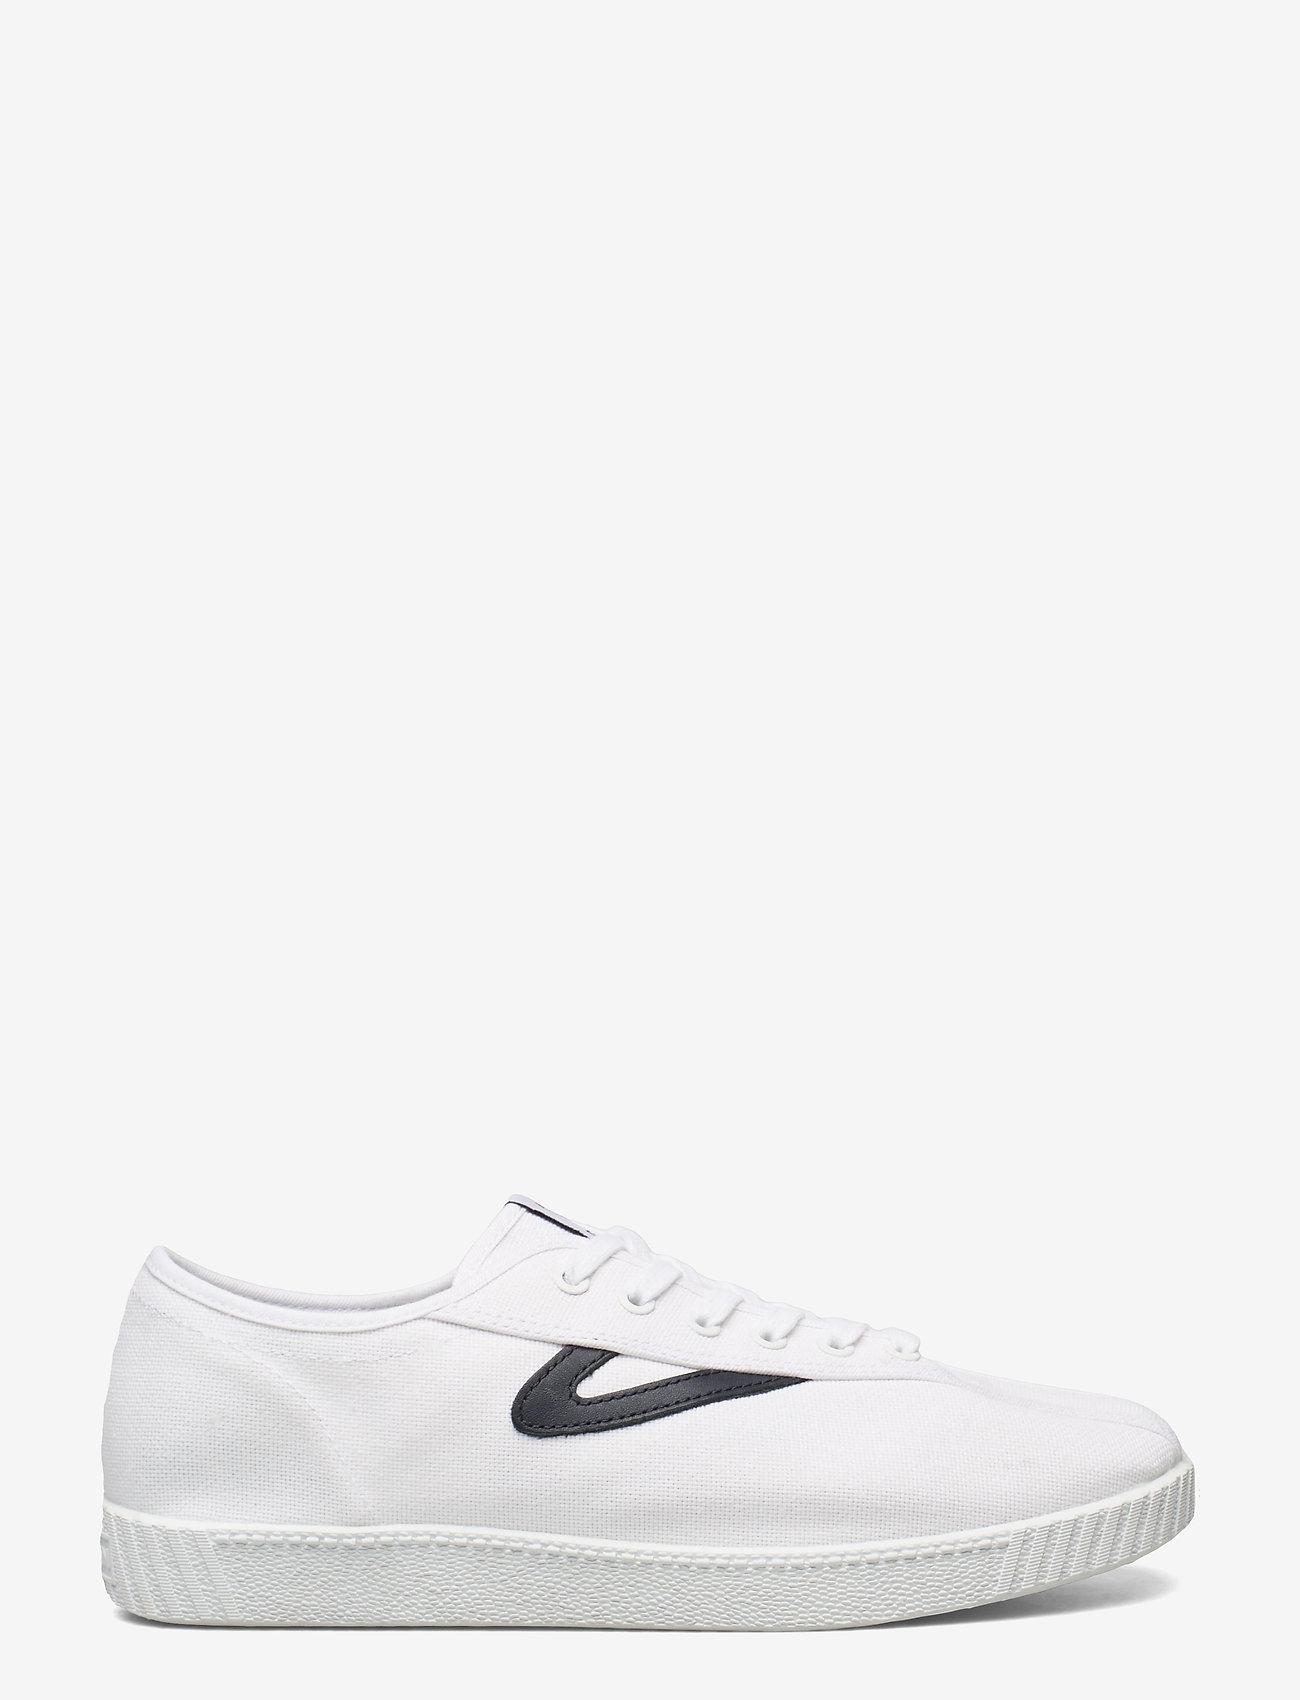 Tretorn - NYLITE - låga sneakers - 031/white/lnavy - 1